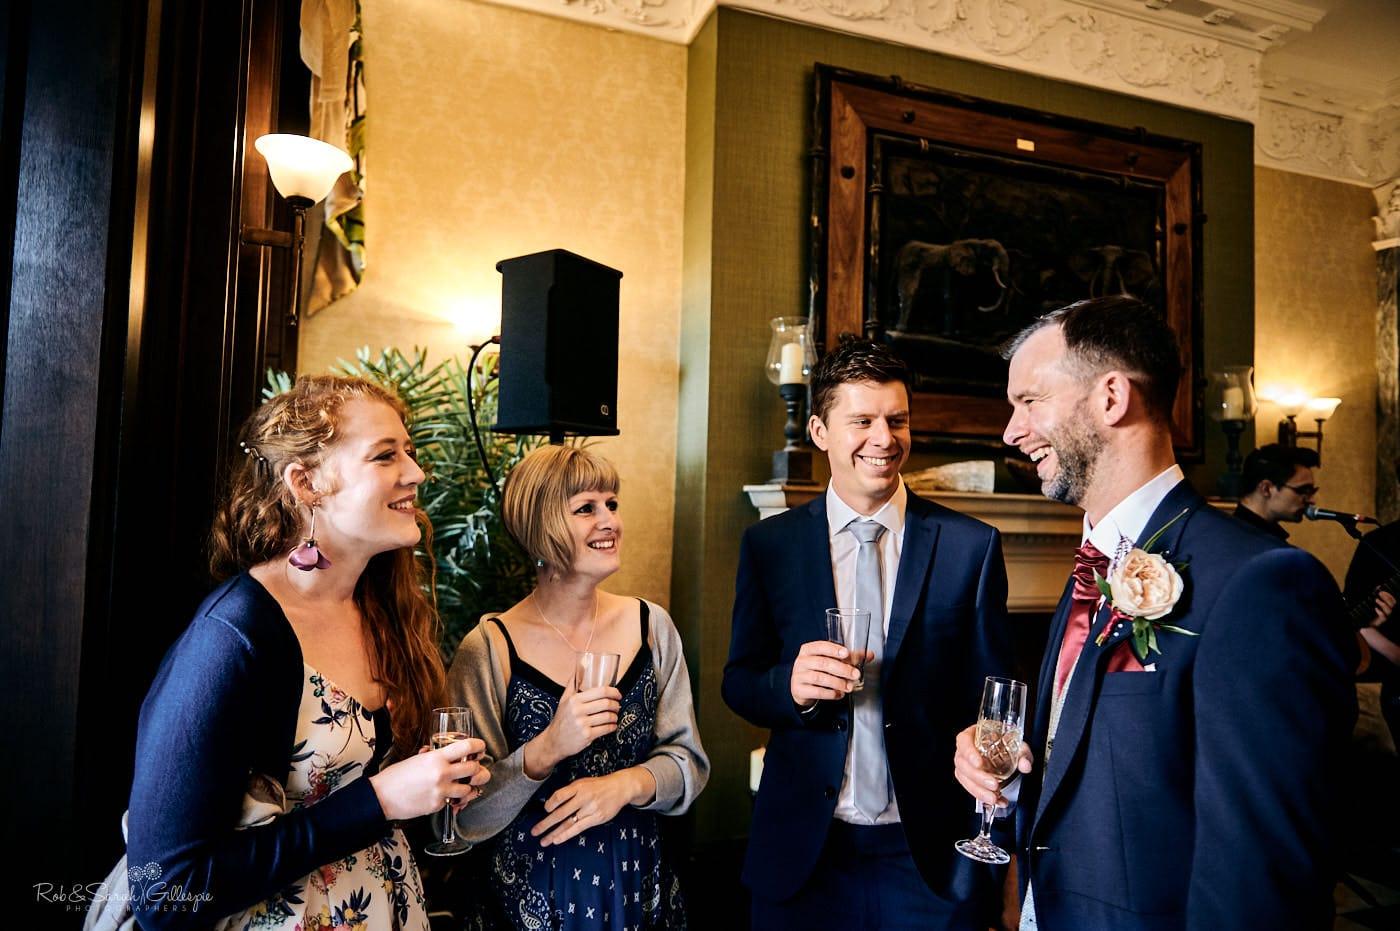 Wedding reception at Spring Grove House